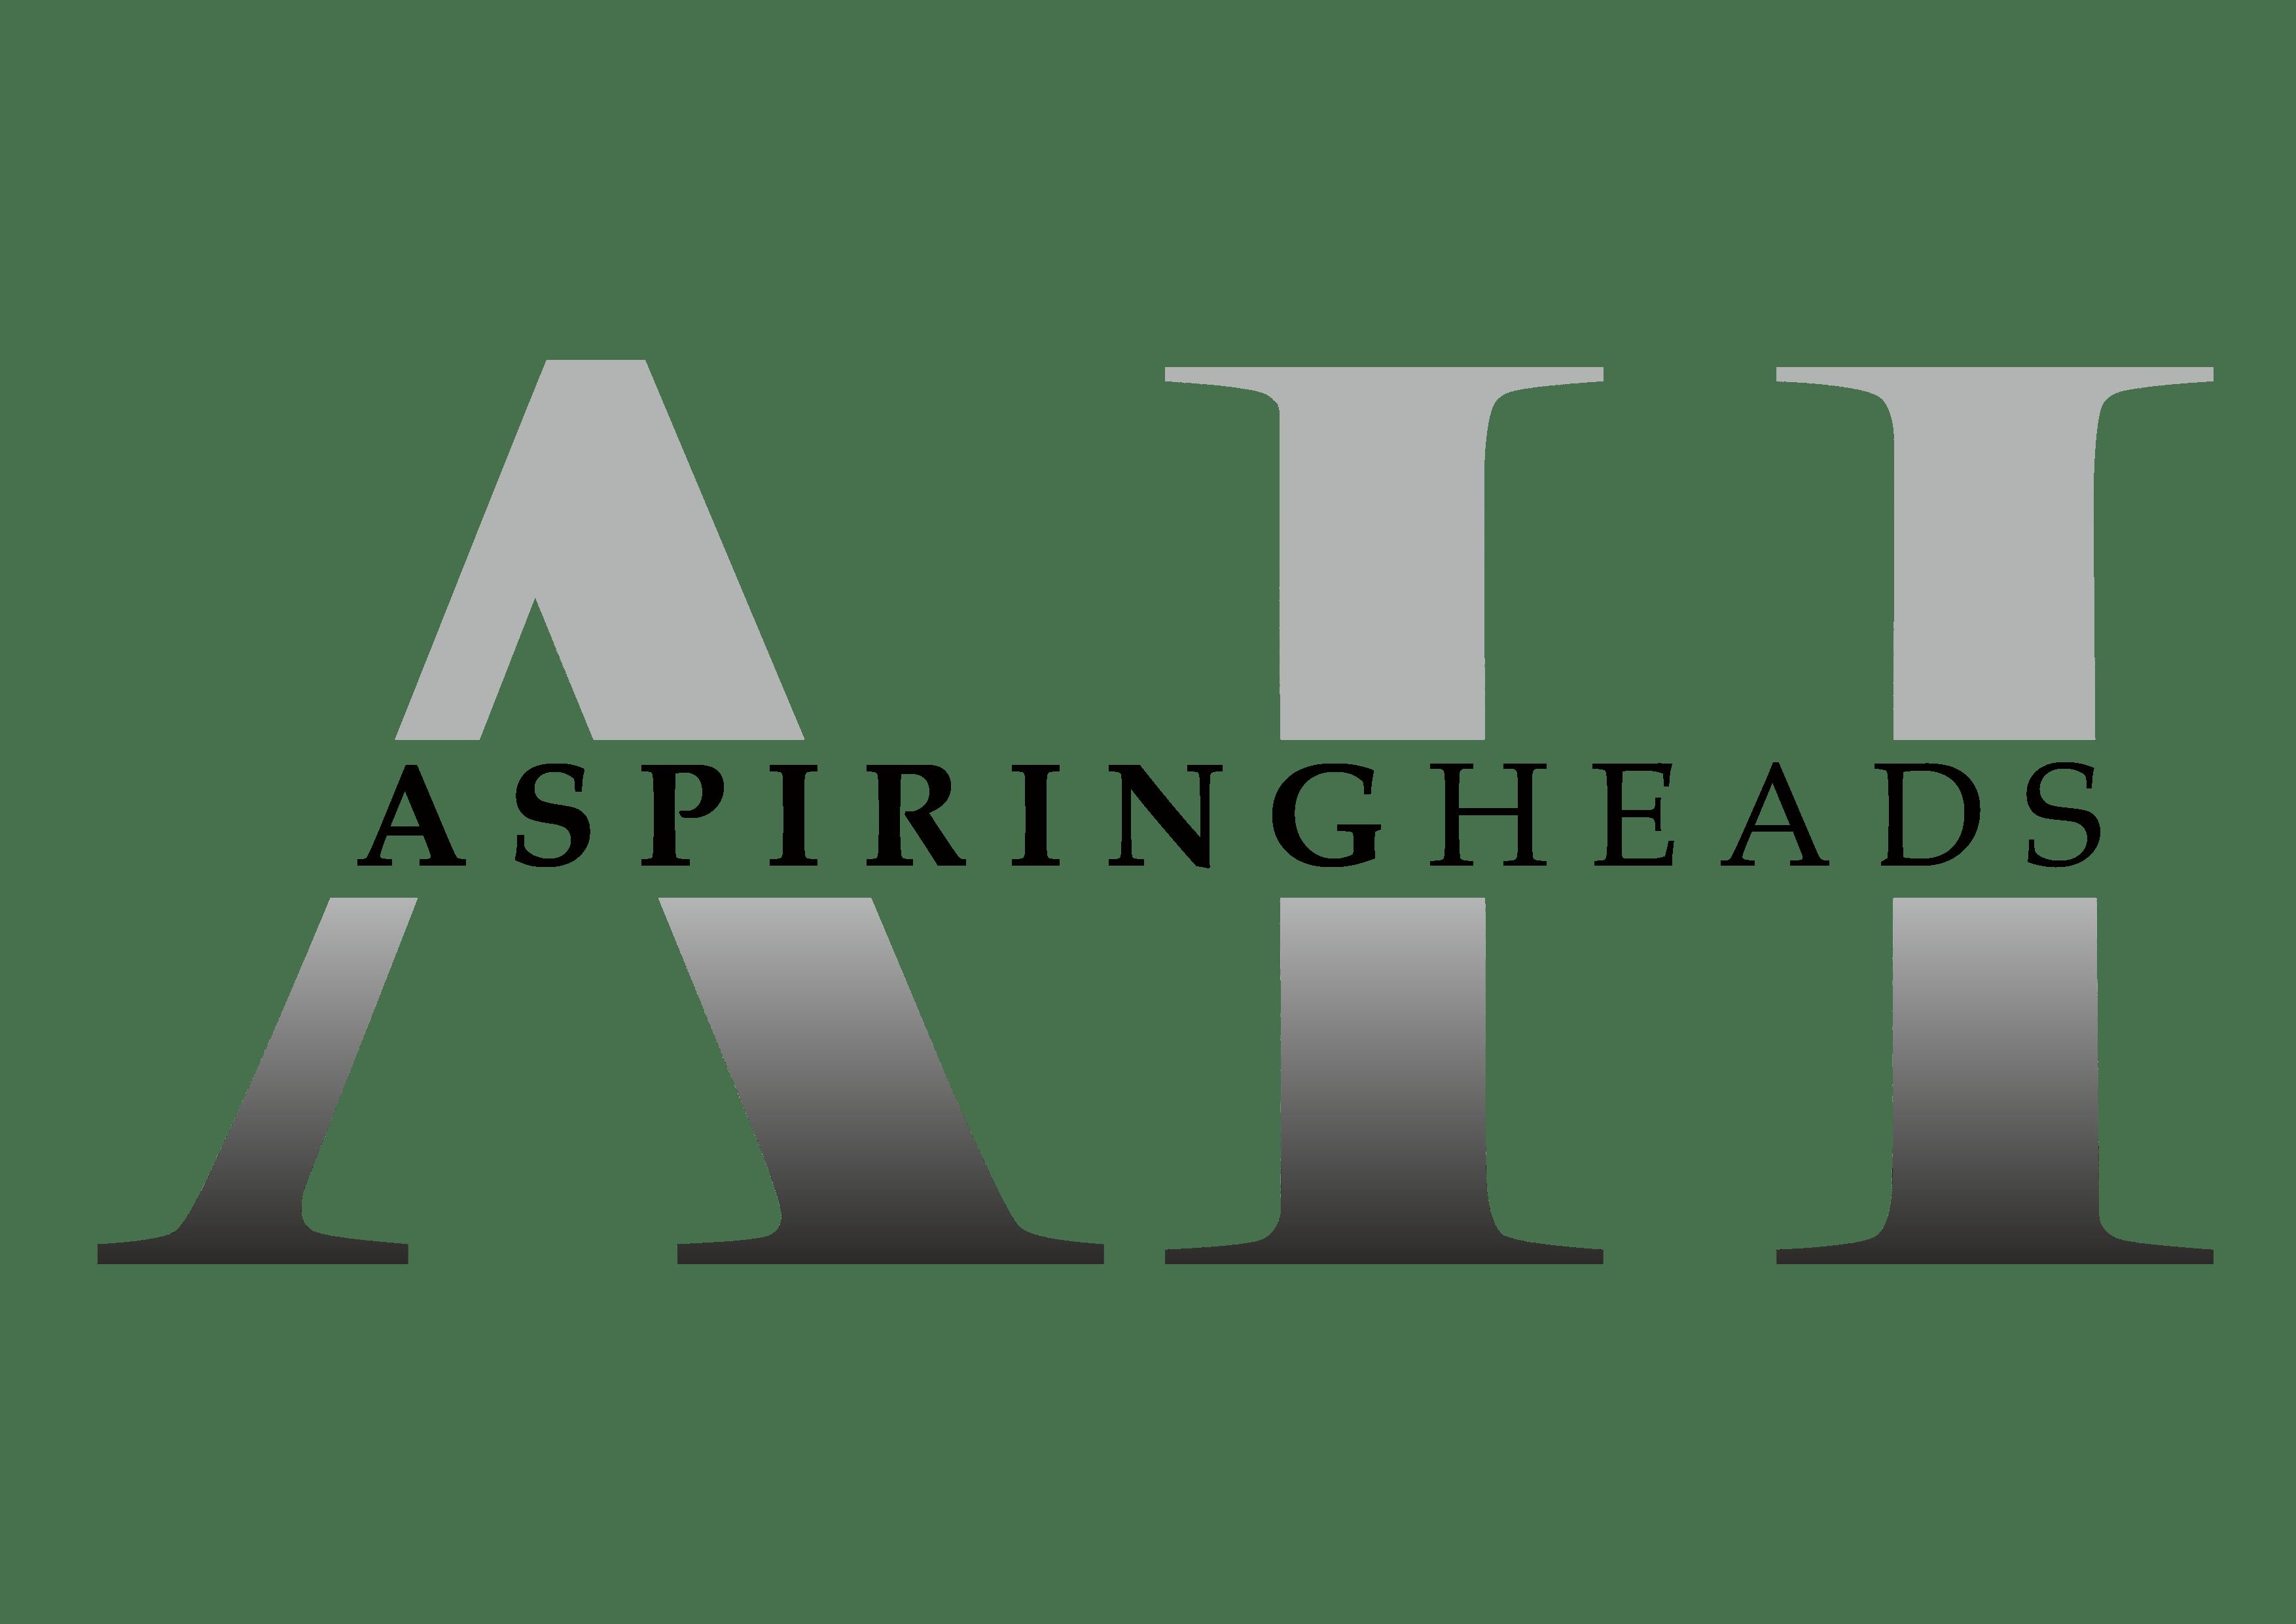 Aspiring Heads